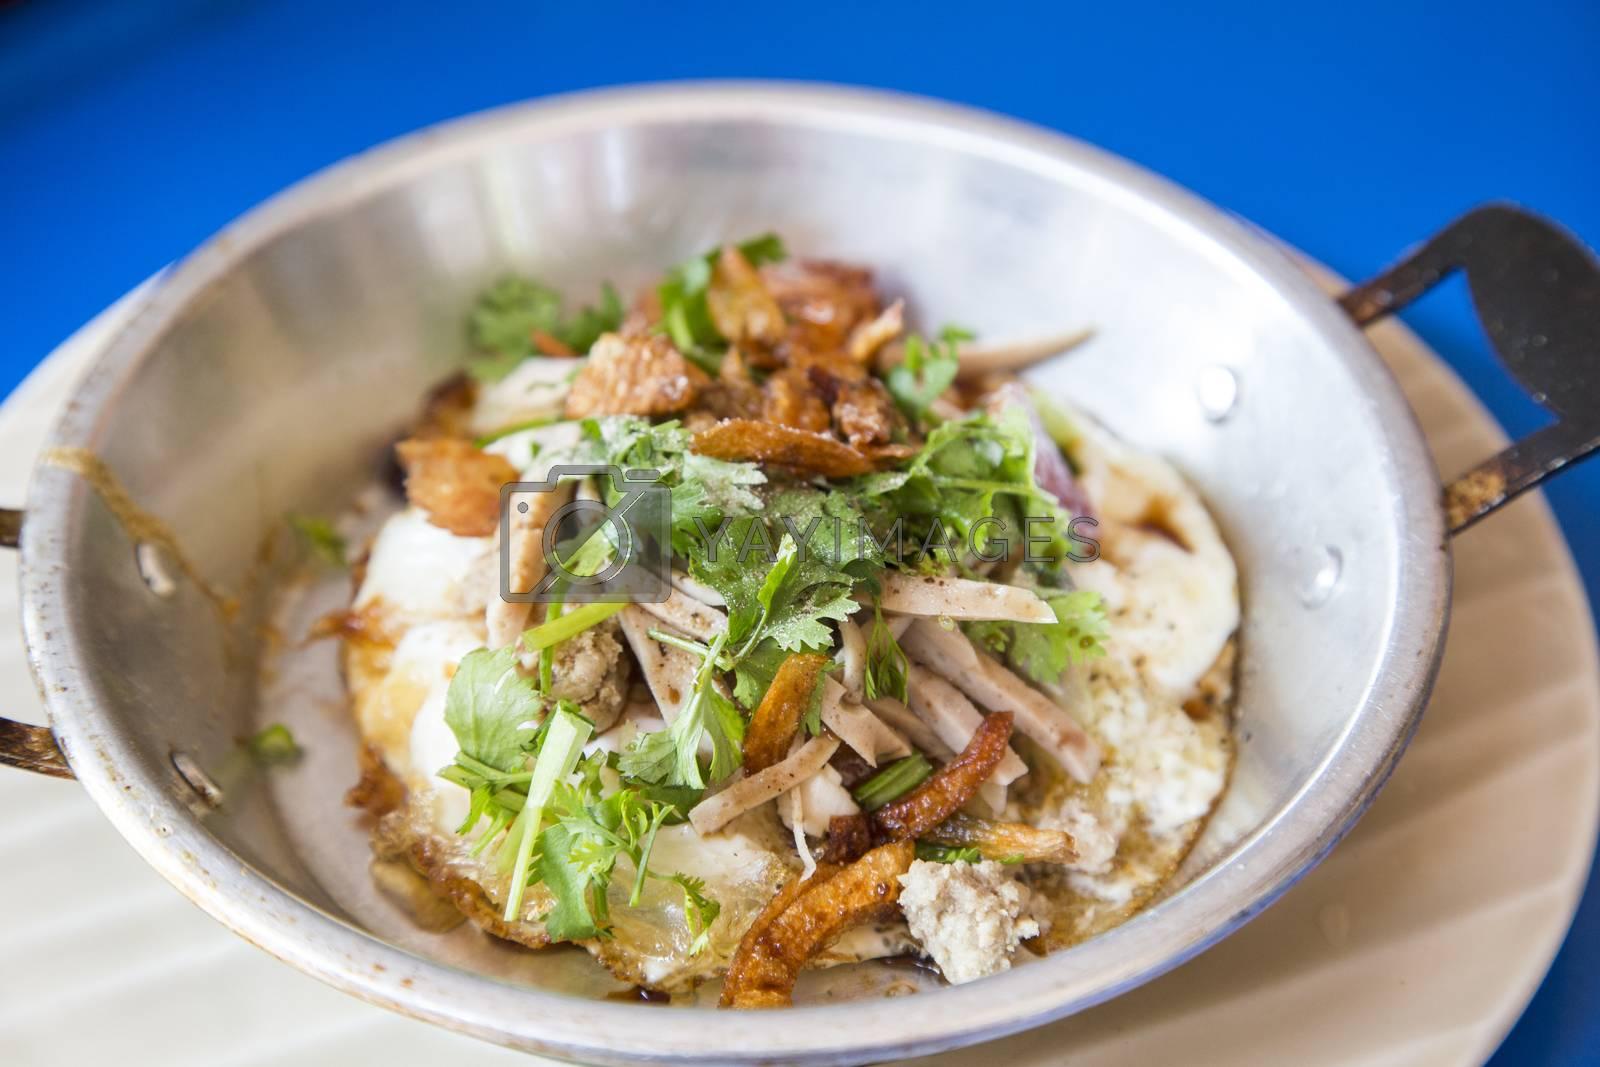 Pan egg breakfast asian food by 2nix